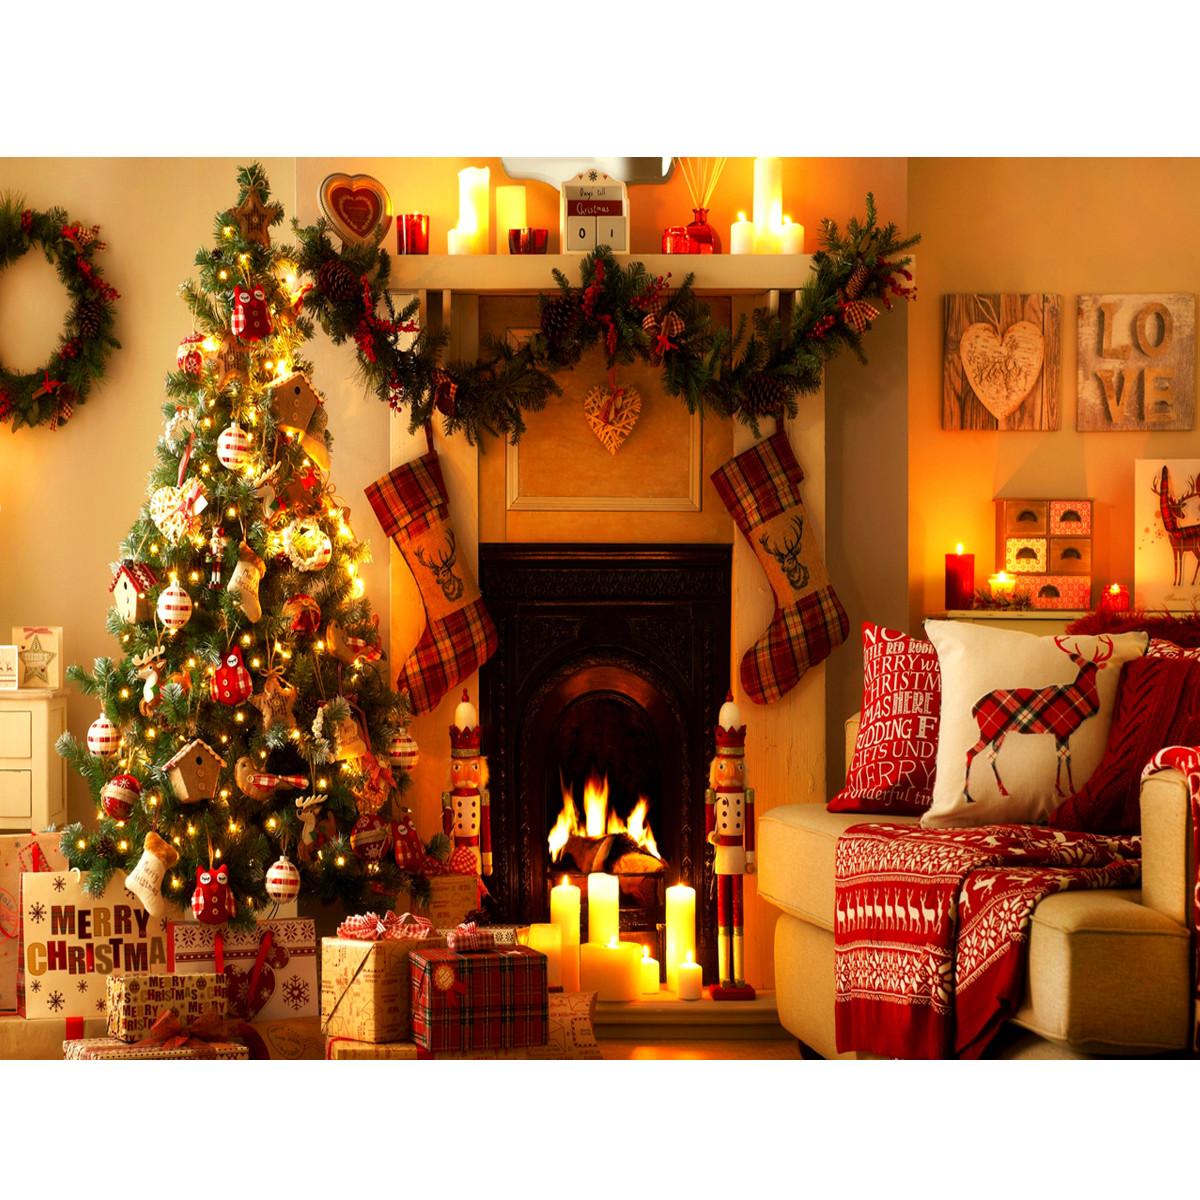 Christmas Tree Fireplace  5x7ft Vinyl Warm Light Christmas Tree Fireplace Stocking